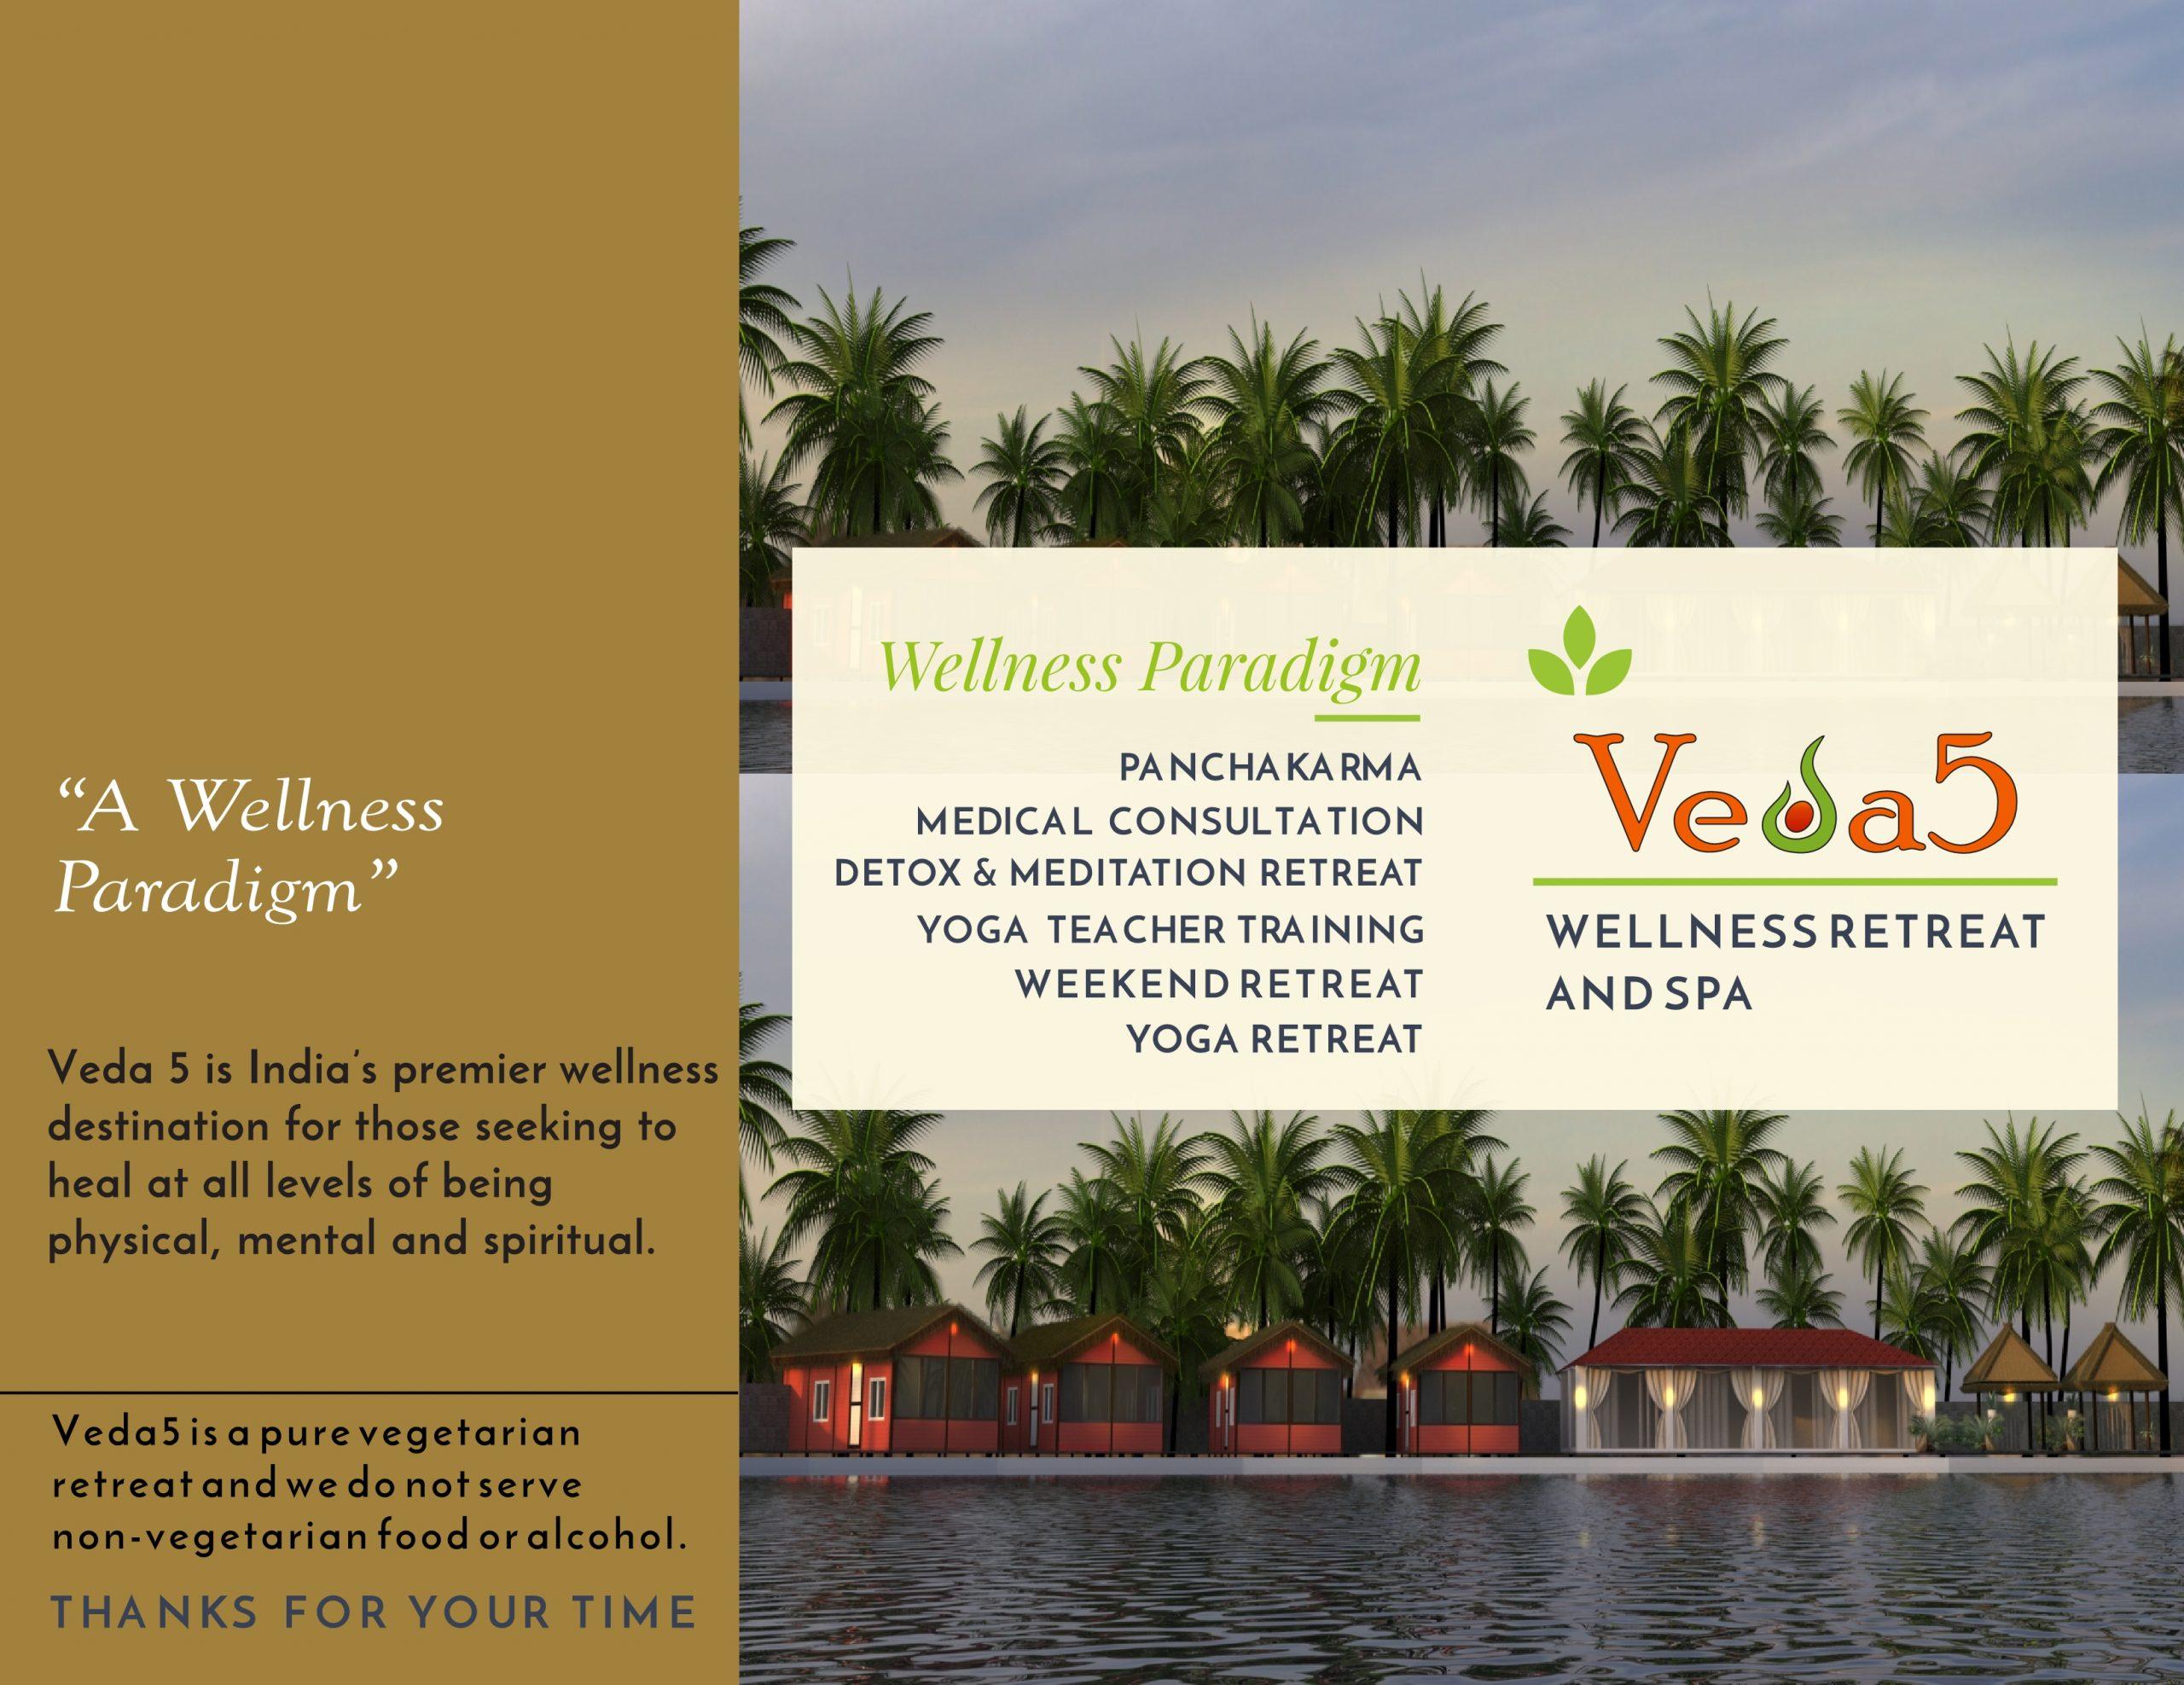 Veda5 Wellness Retreat and Spa in Arambol Goa India for Ayurveda Panchakarma Detox Yoga Meditation and Hotel Resort for Vacation